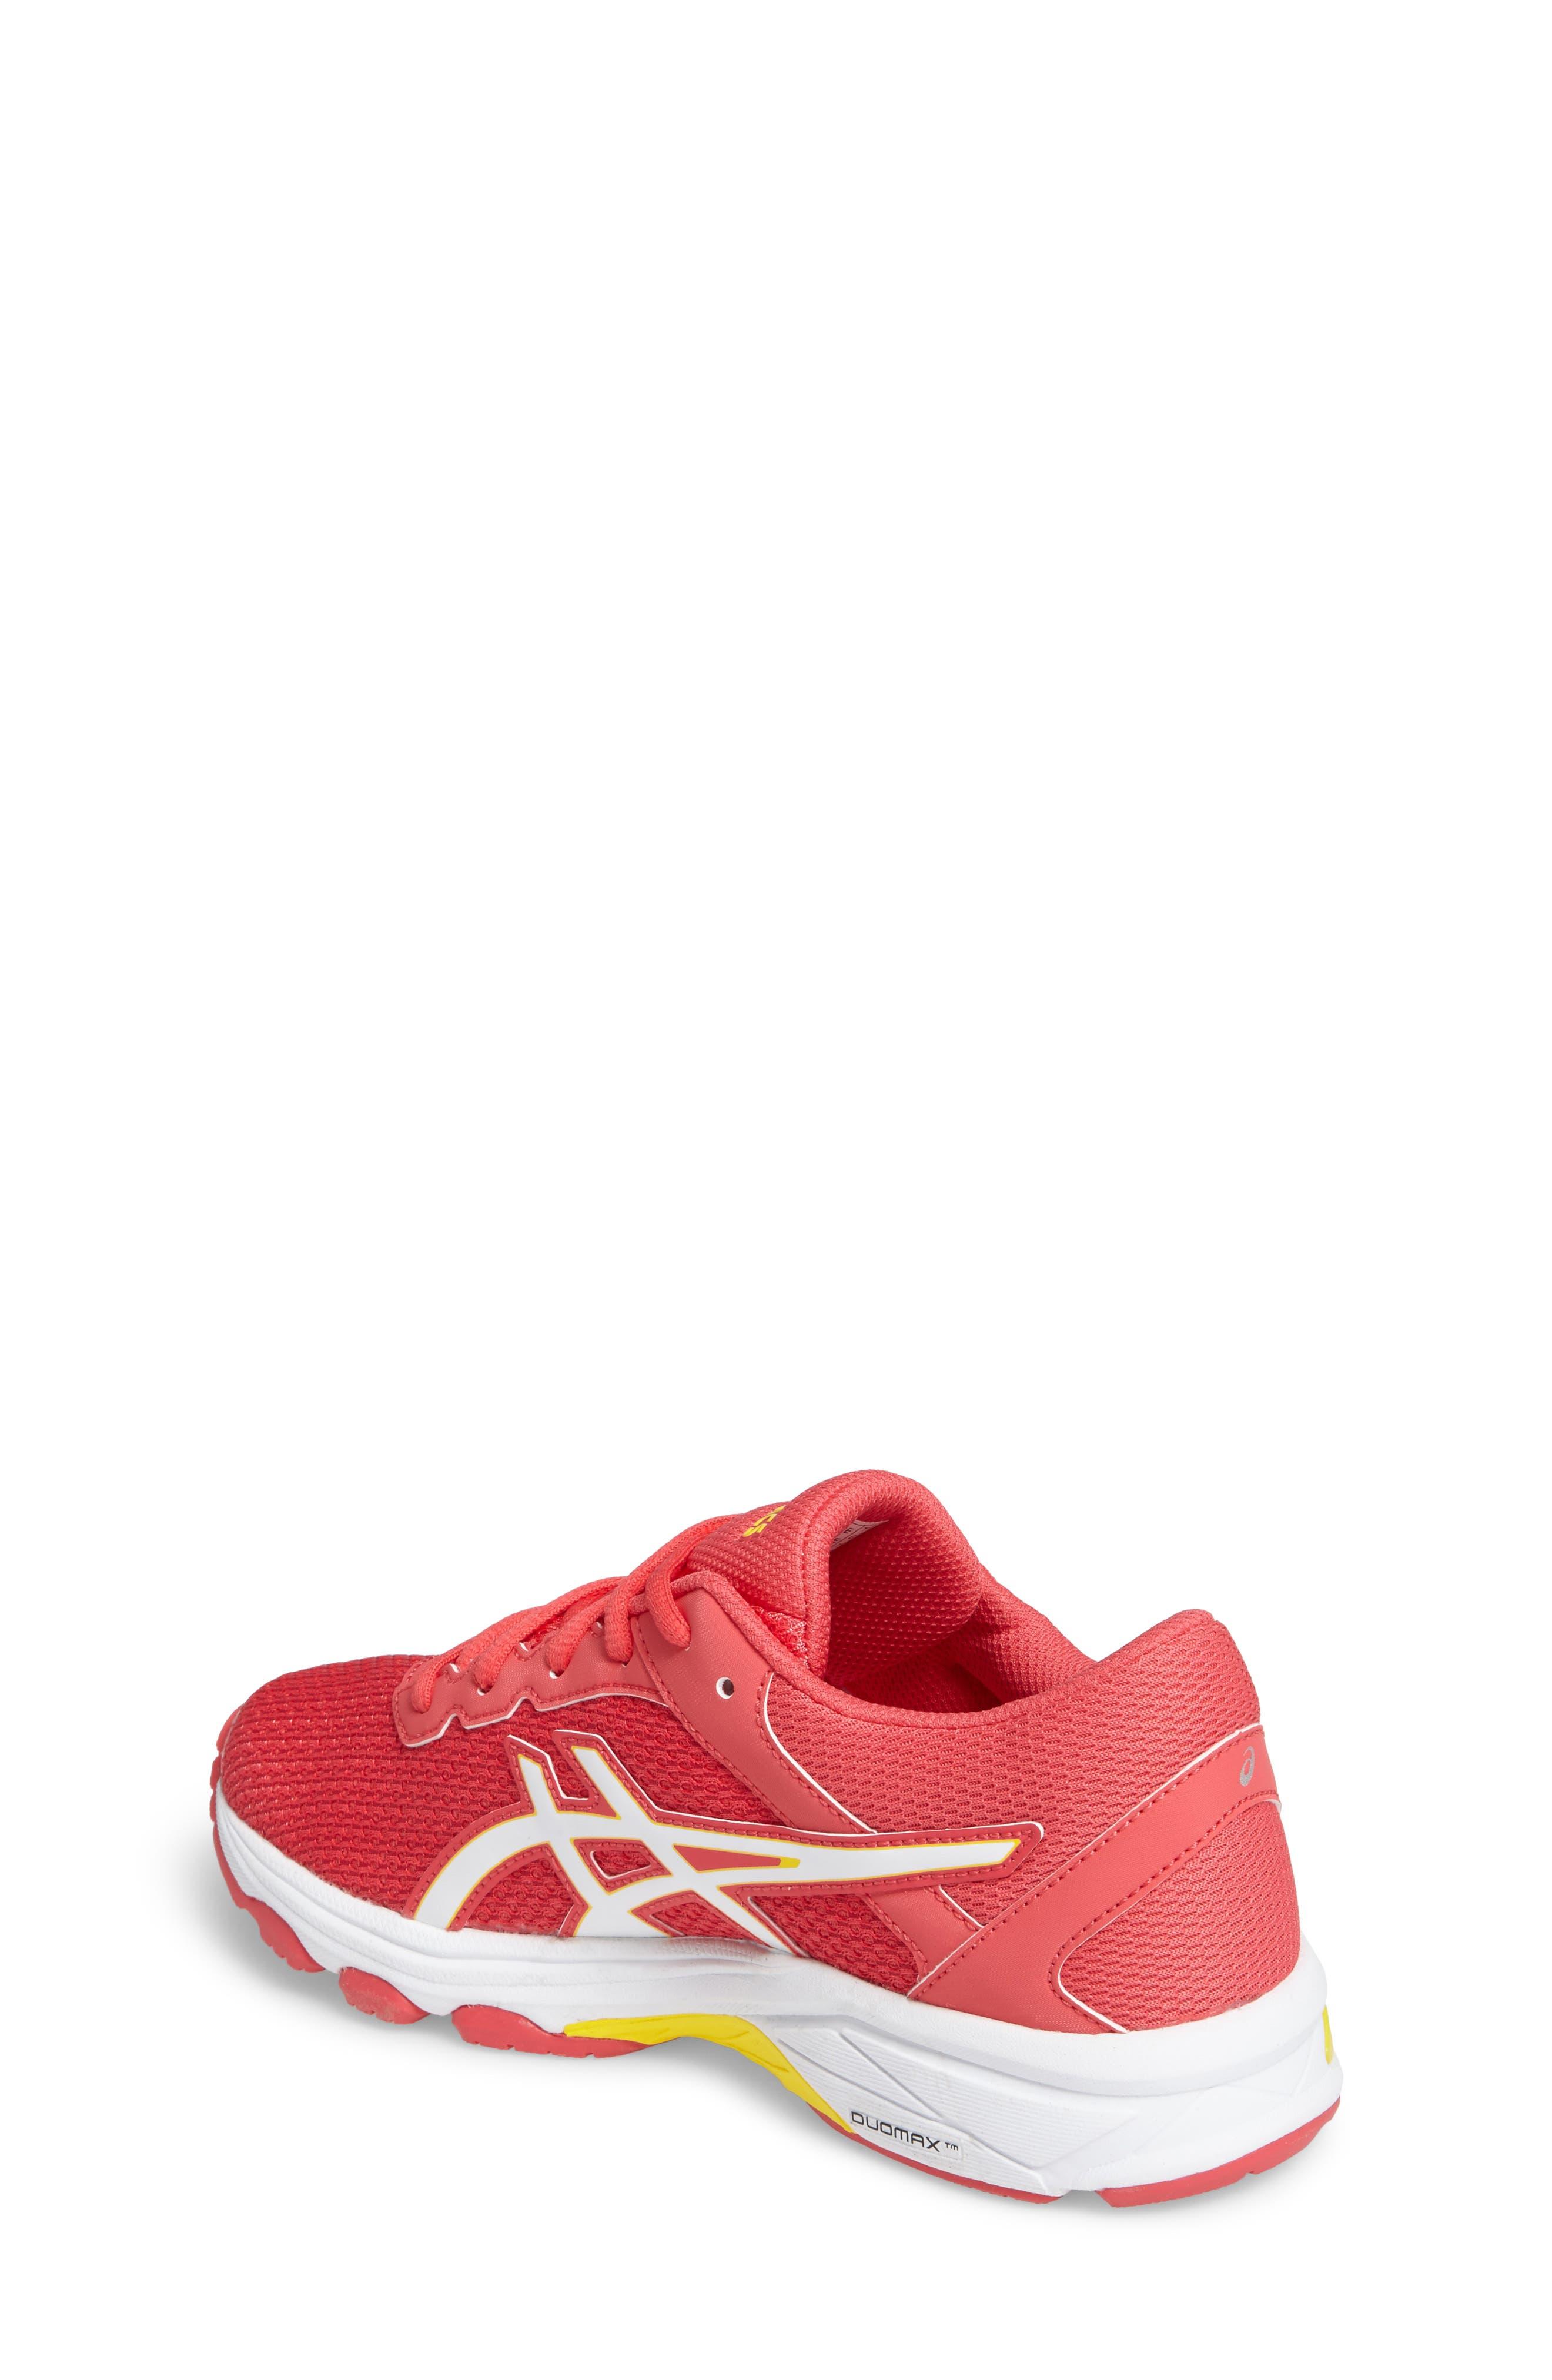 Asics GT-1000<sup>™</sup> 6 GS Sneaker,                             Alternate thumbnail 10, color,